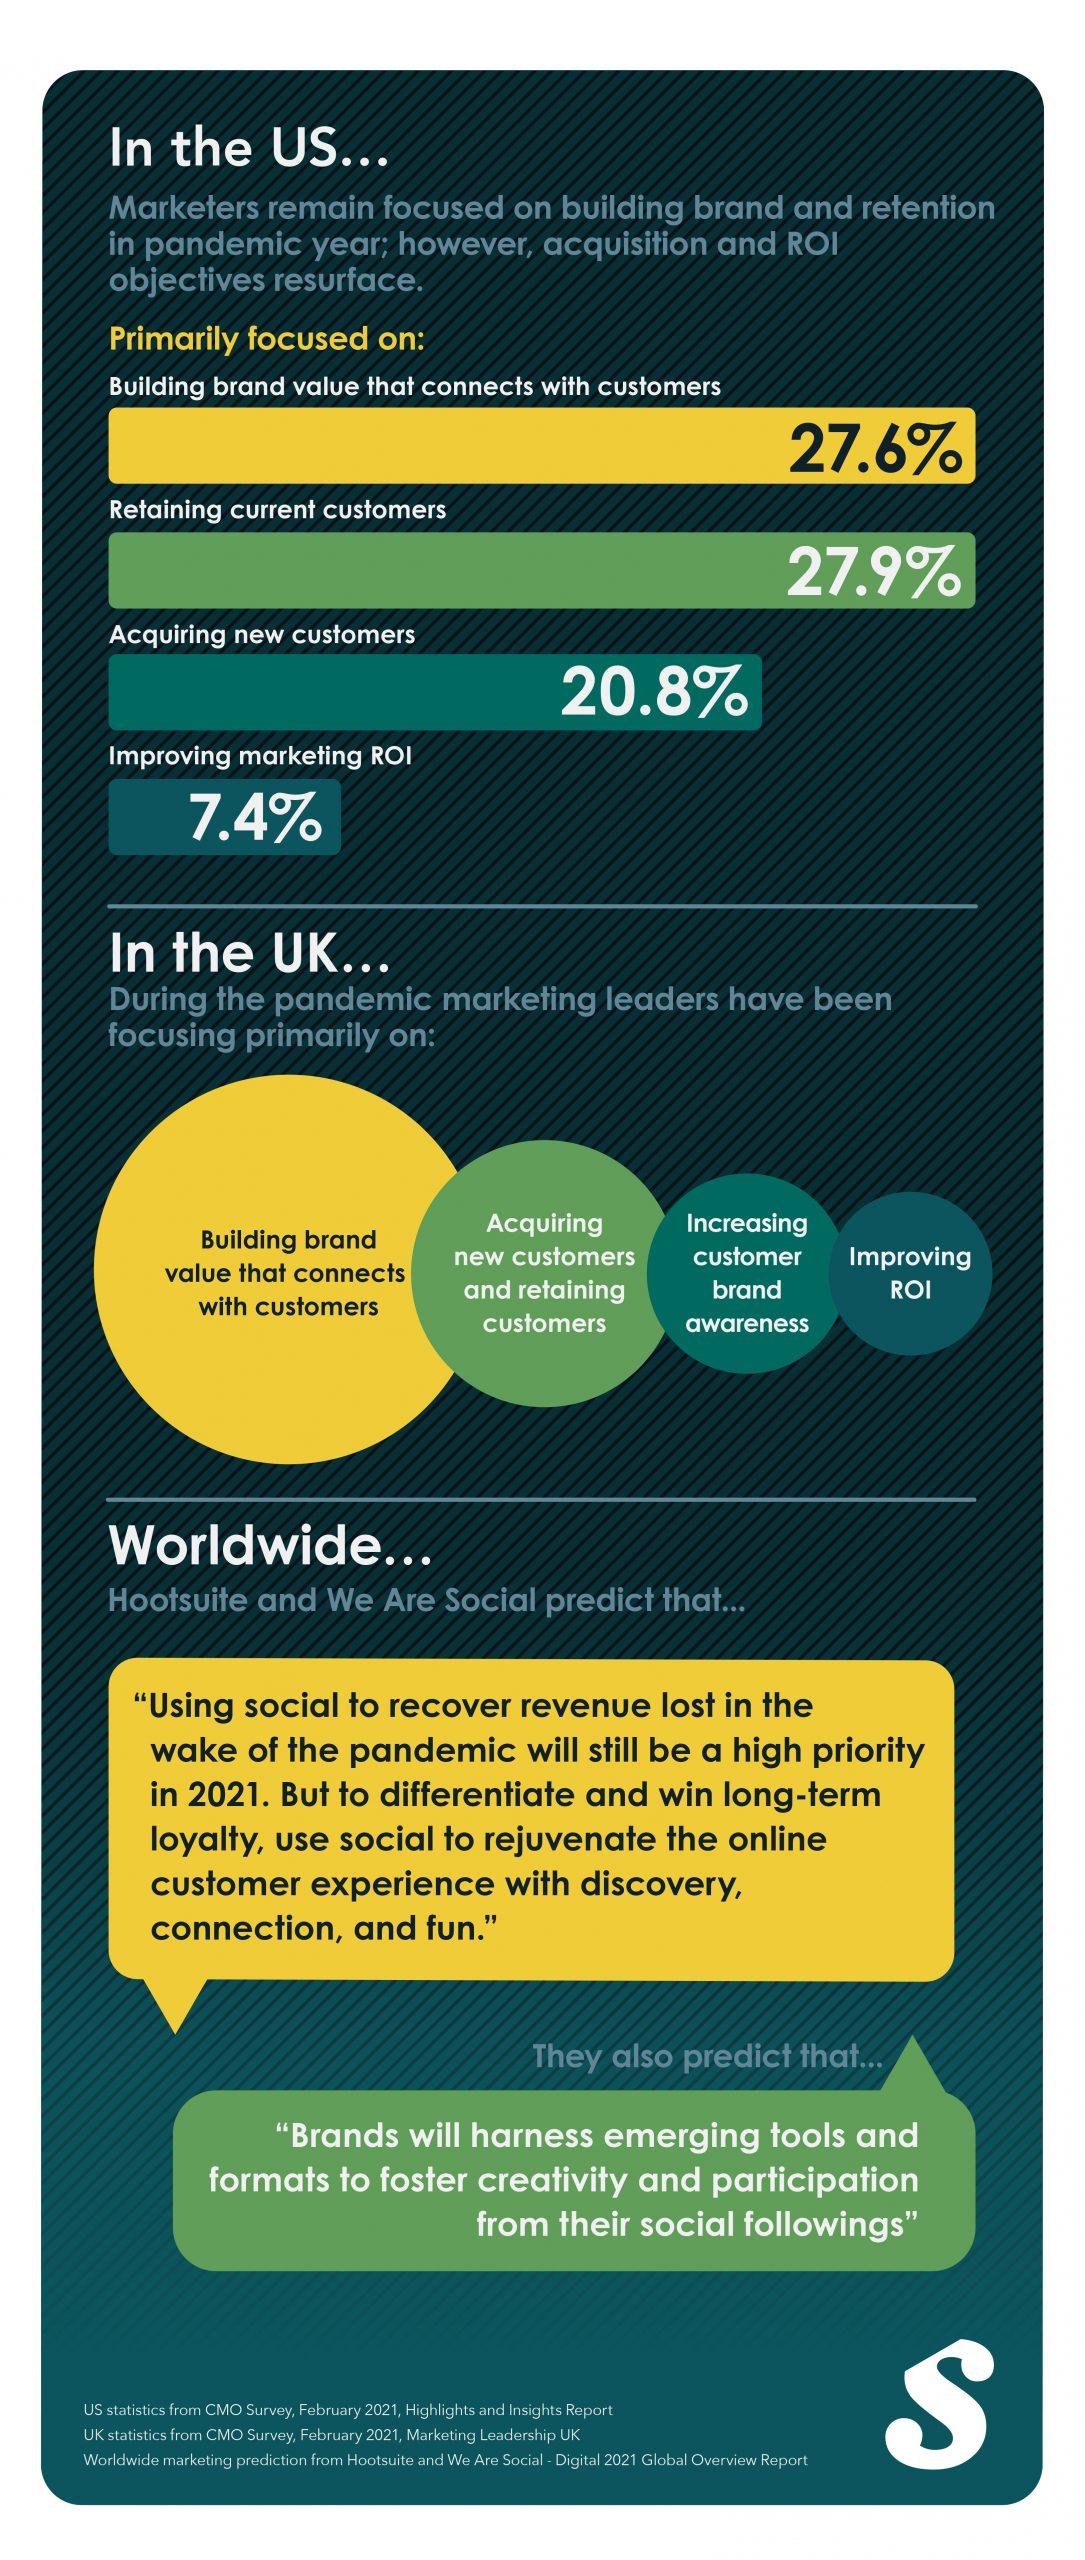 2021 marketing landscape